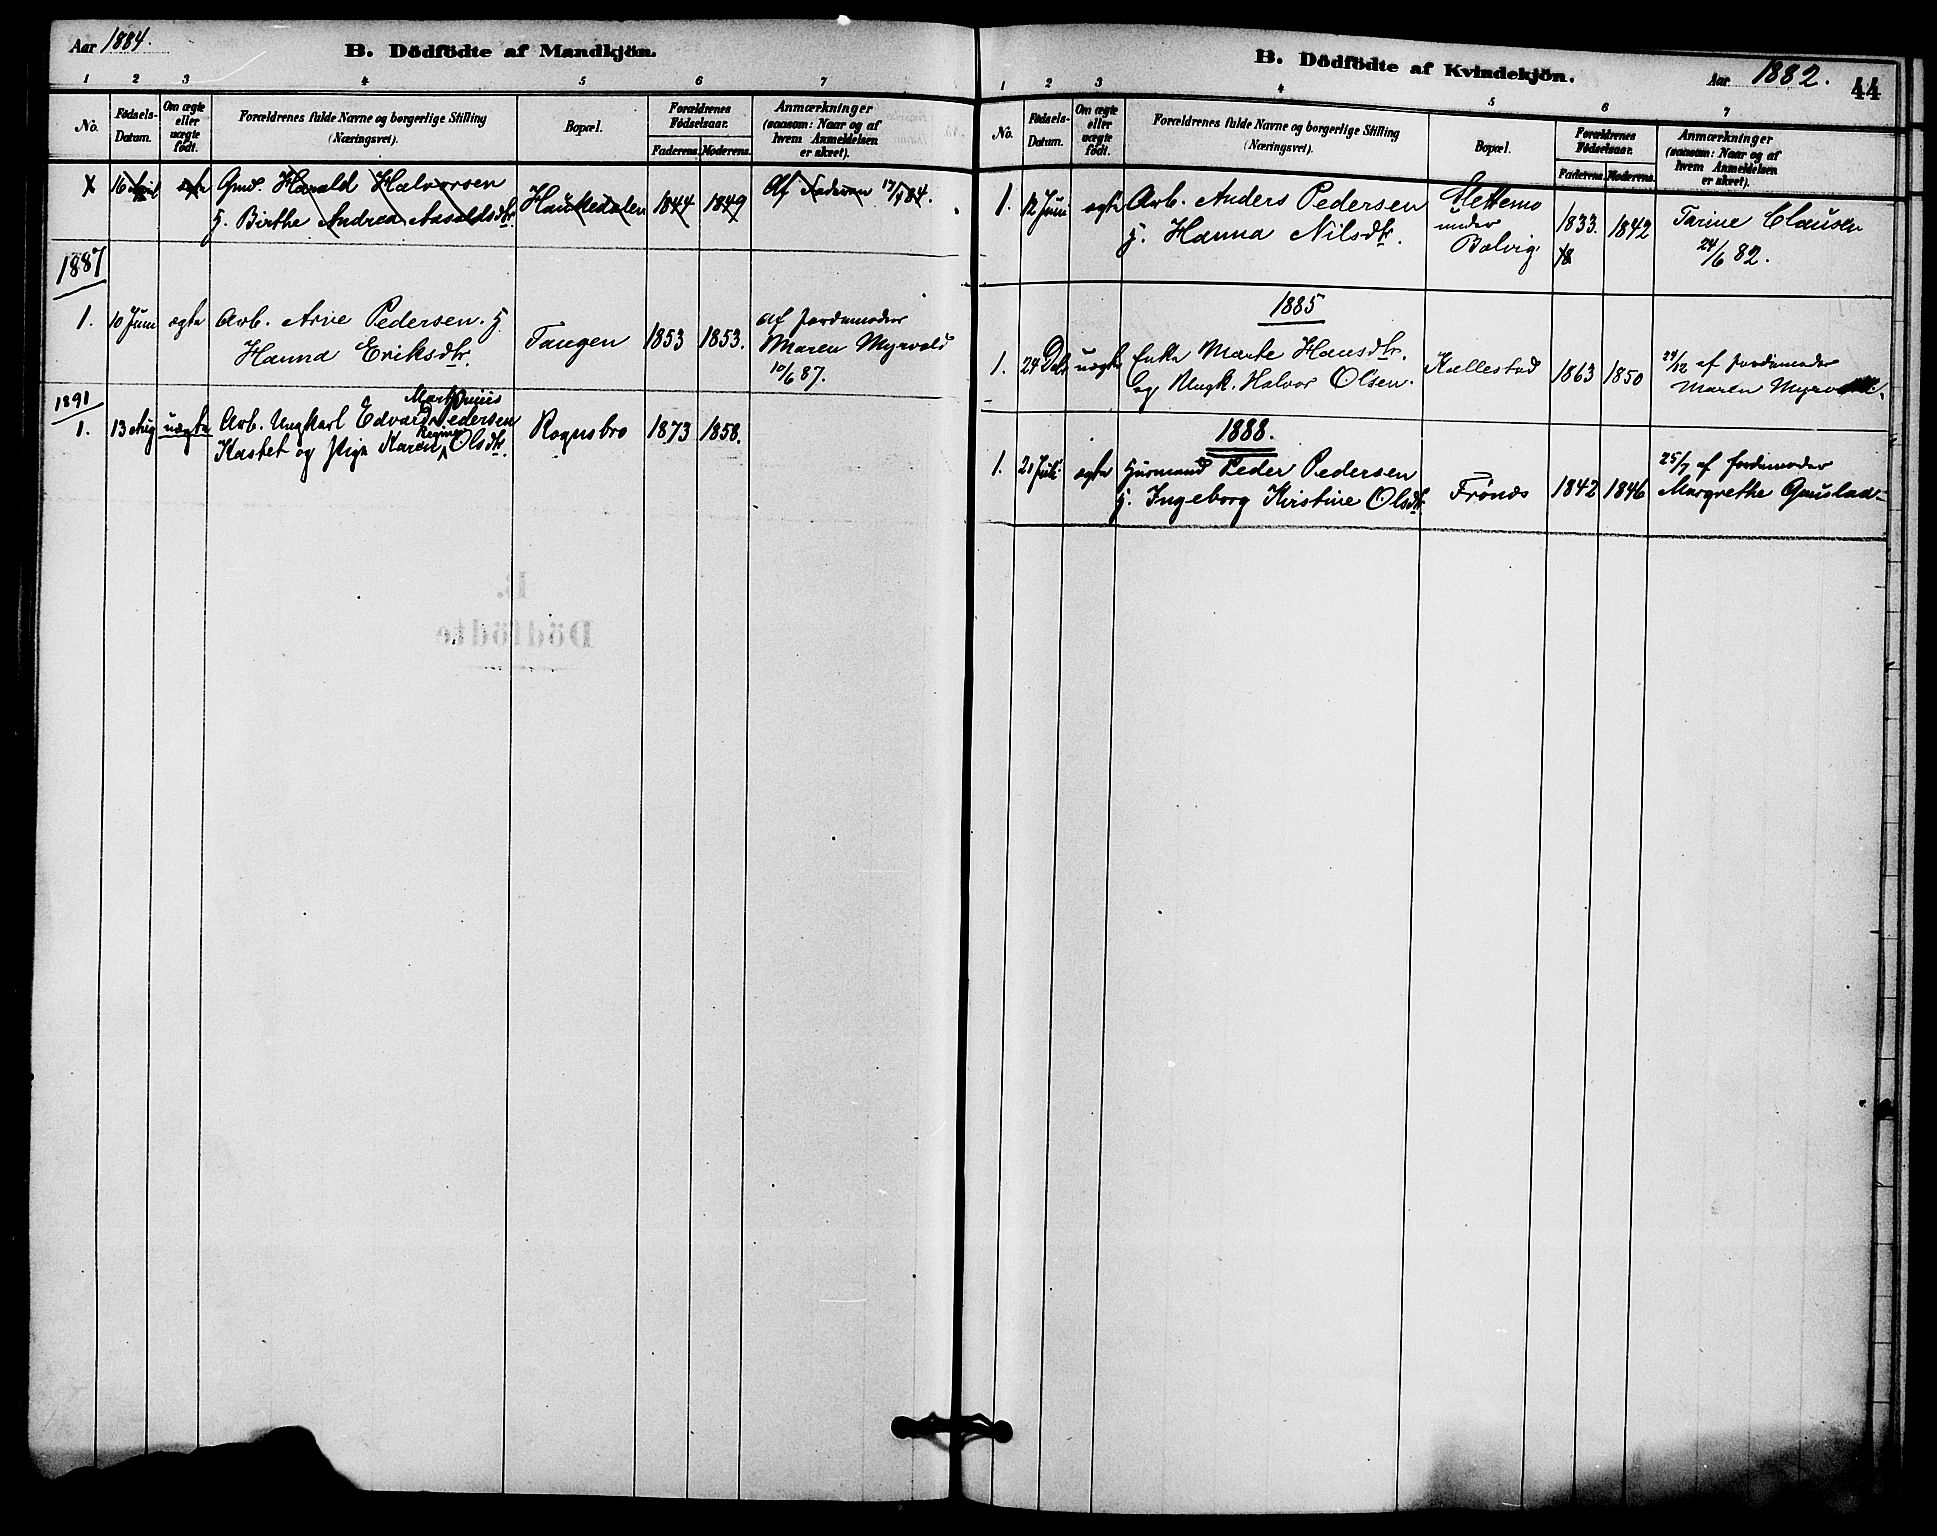 SAKO, Solum kirkebøker, F/Fc/L0001: Ministerialbok nr. III 1, 1877-1891, s. 44